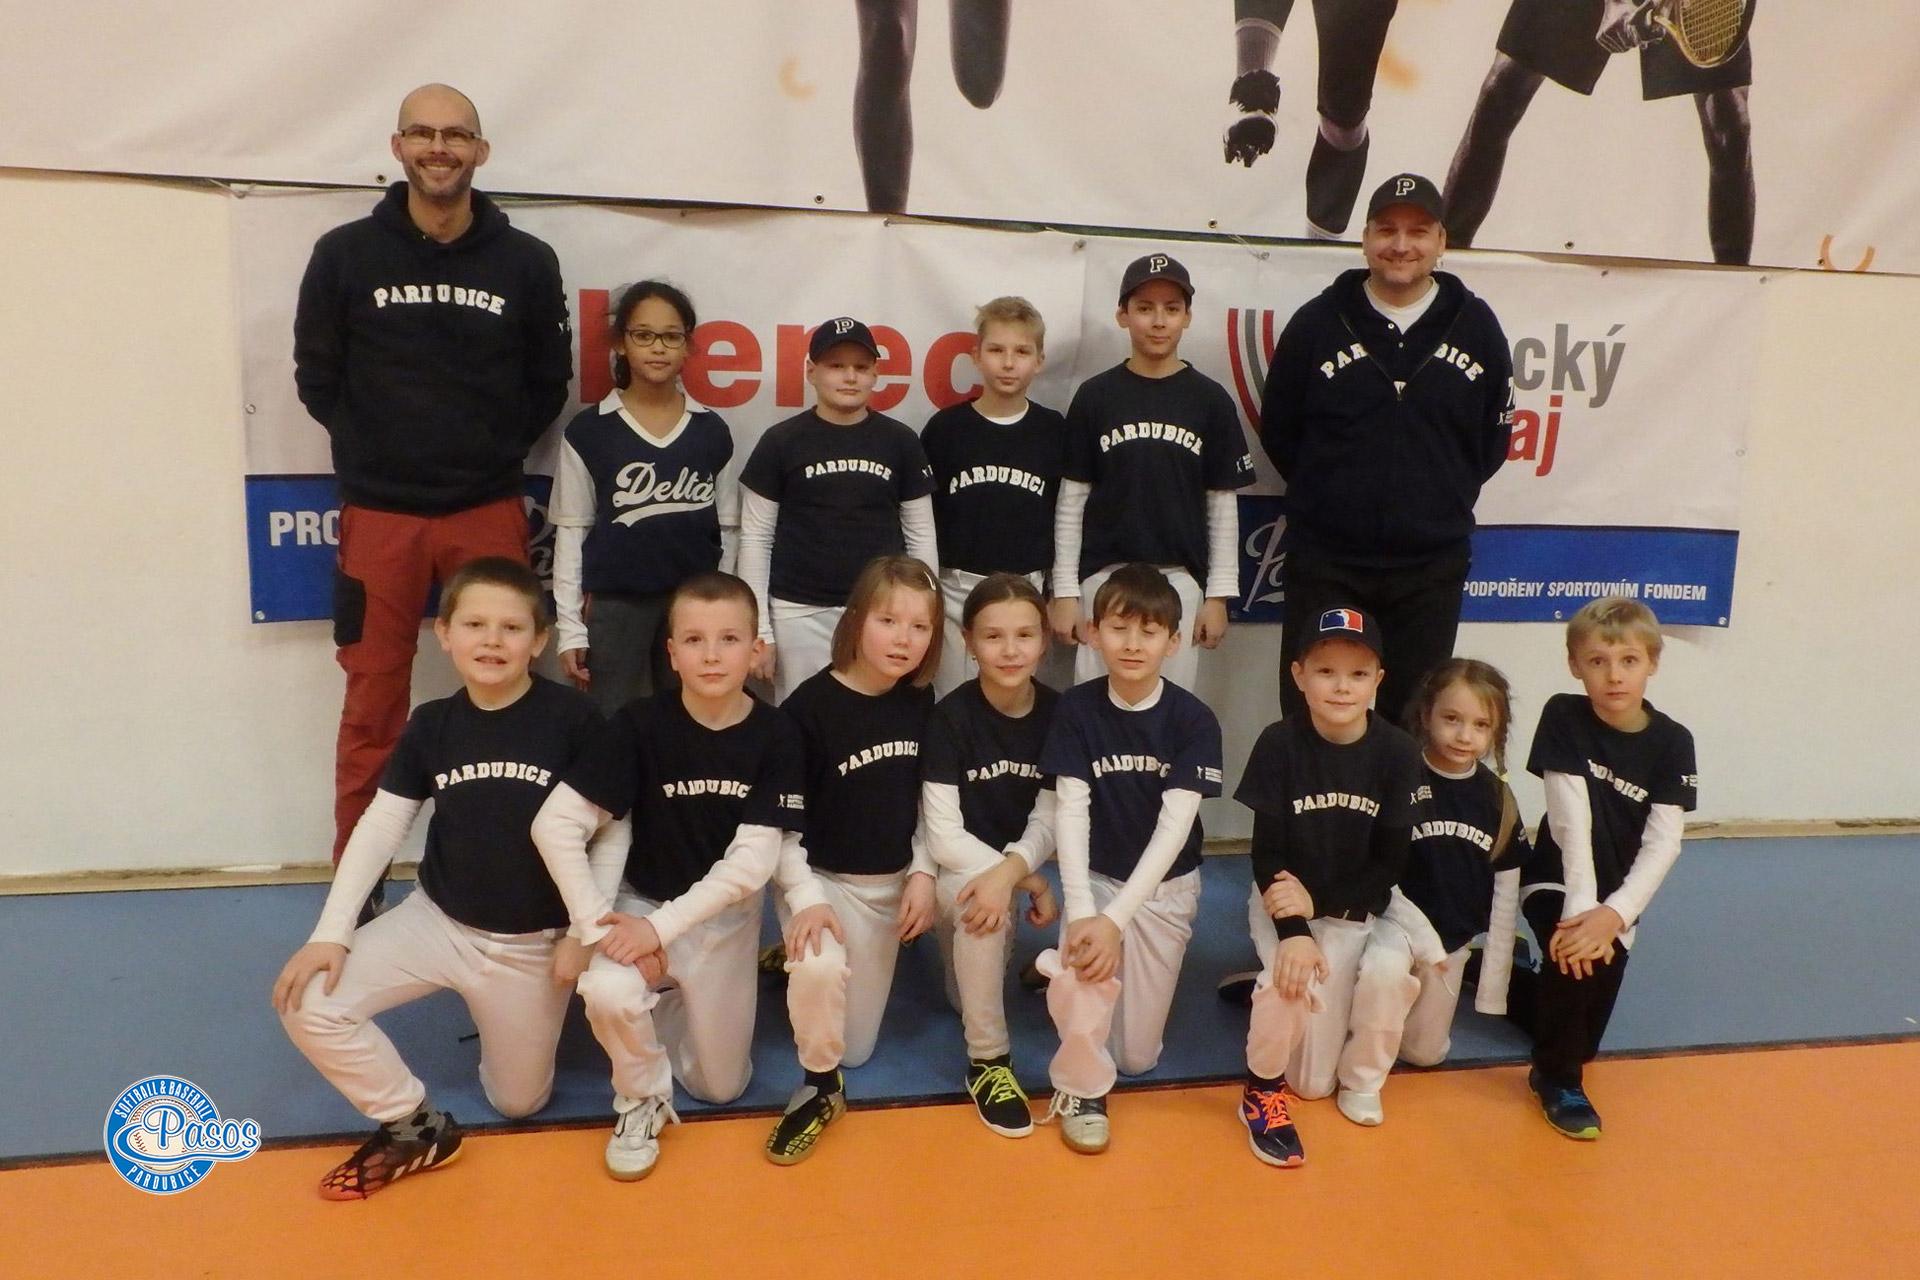 Pasos Pardubice - Coachball U11